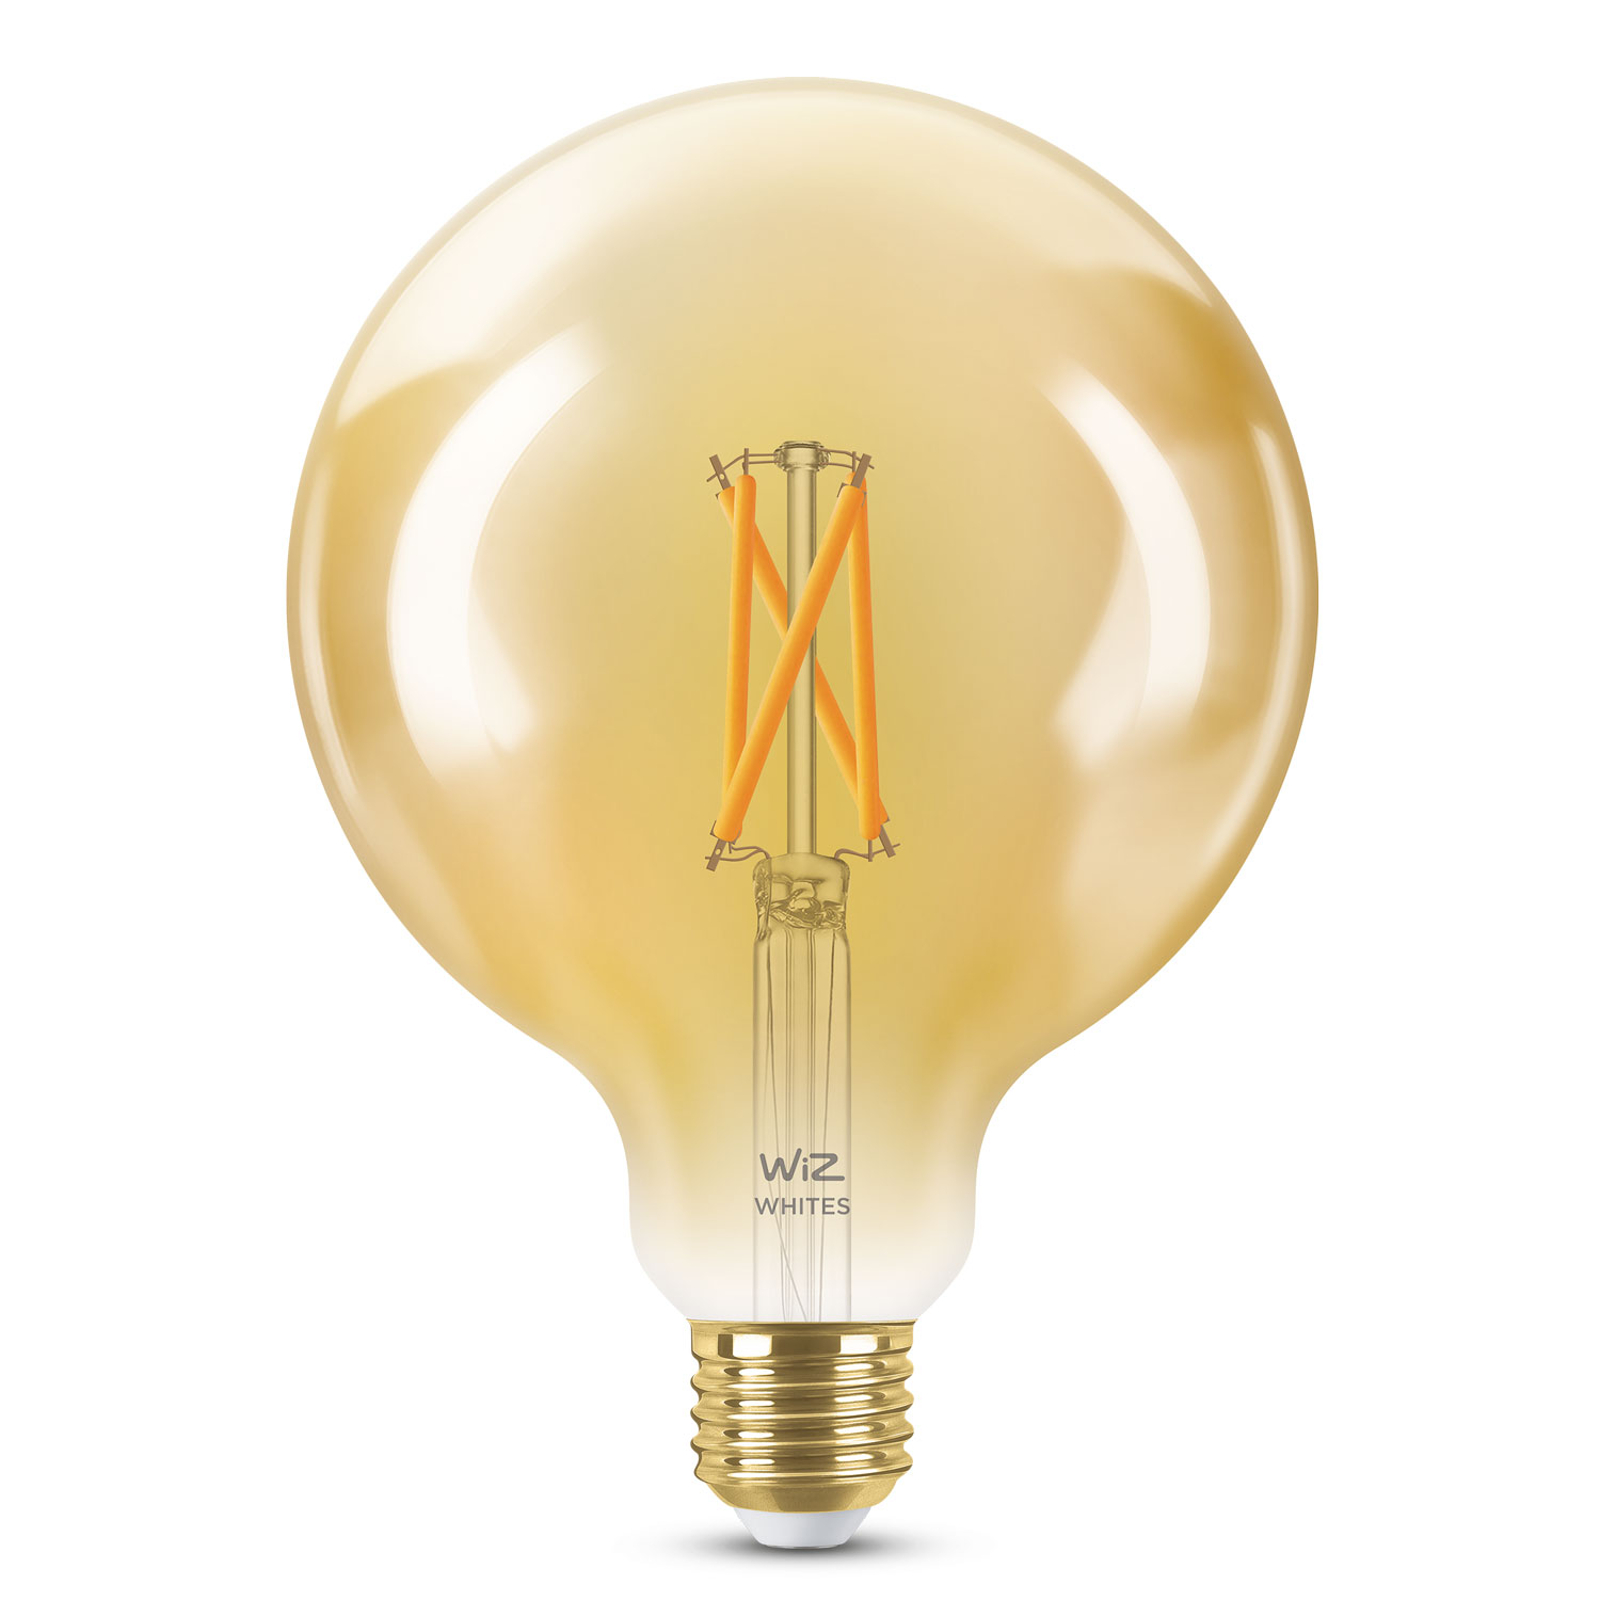 WiZ E27 LED G95 Filament amber 6,5W 2.000-4.500K